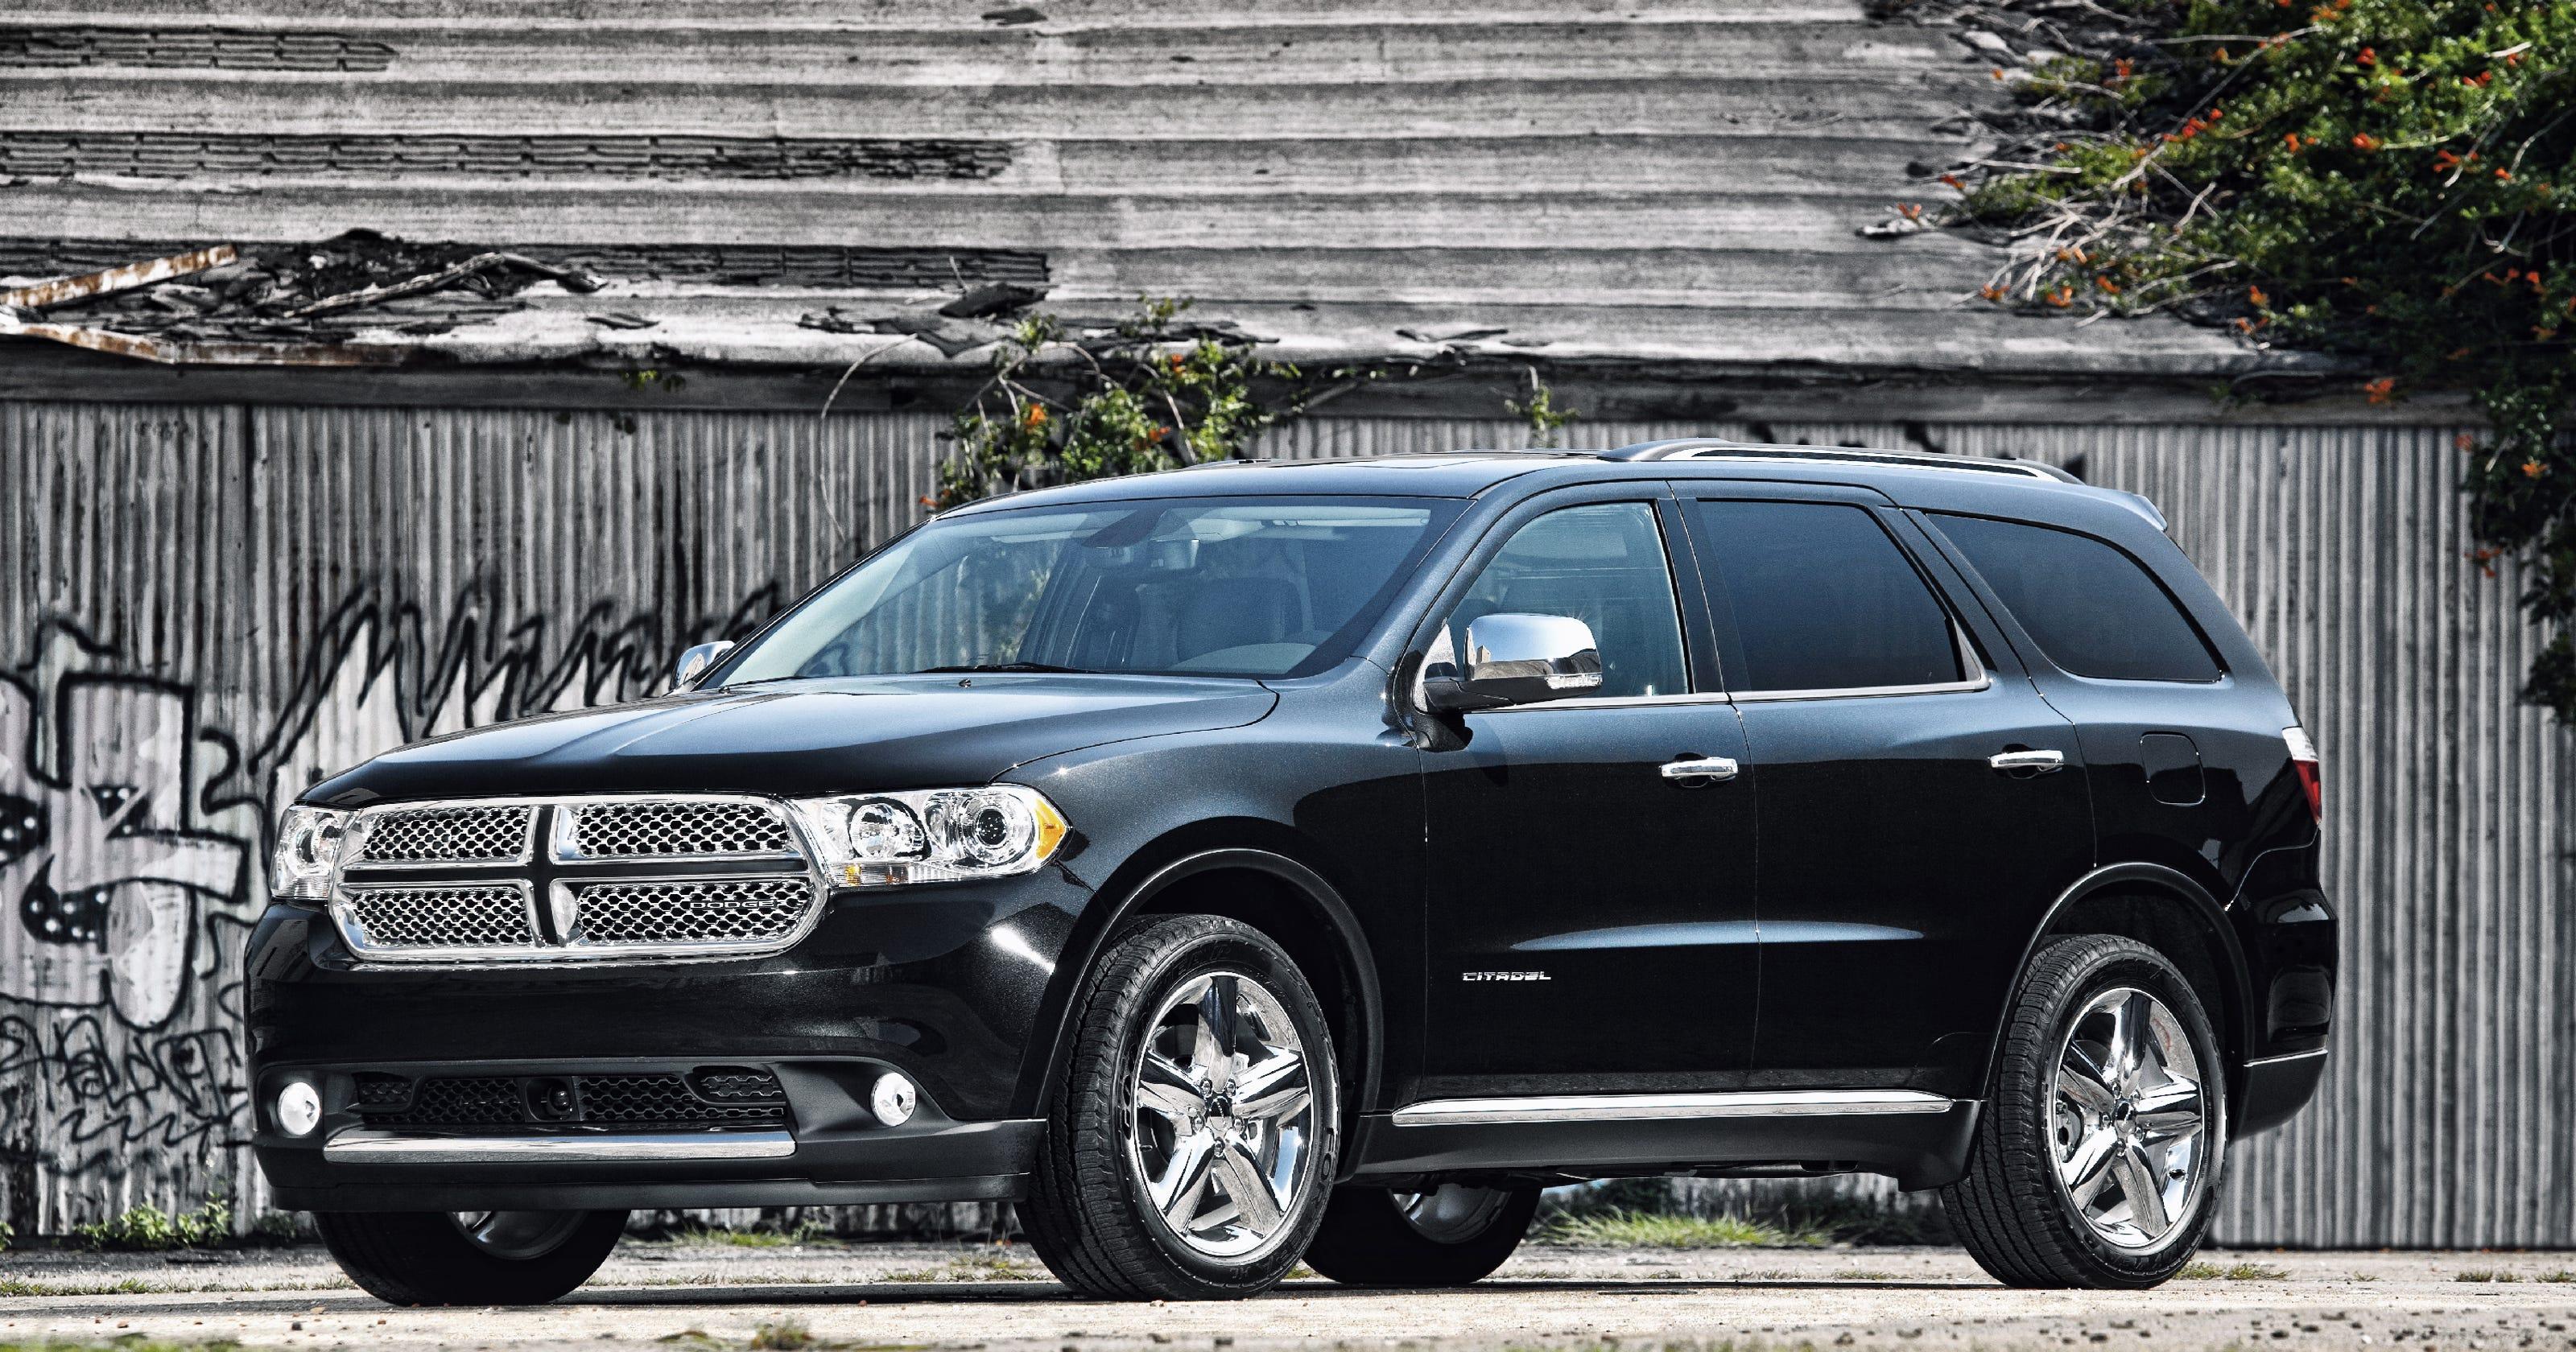 757e5188d0f Fiat Chrysler recall: 700,000 Jeep, Dodge SUVs may need brake fix